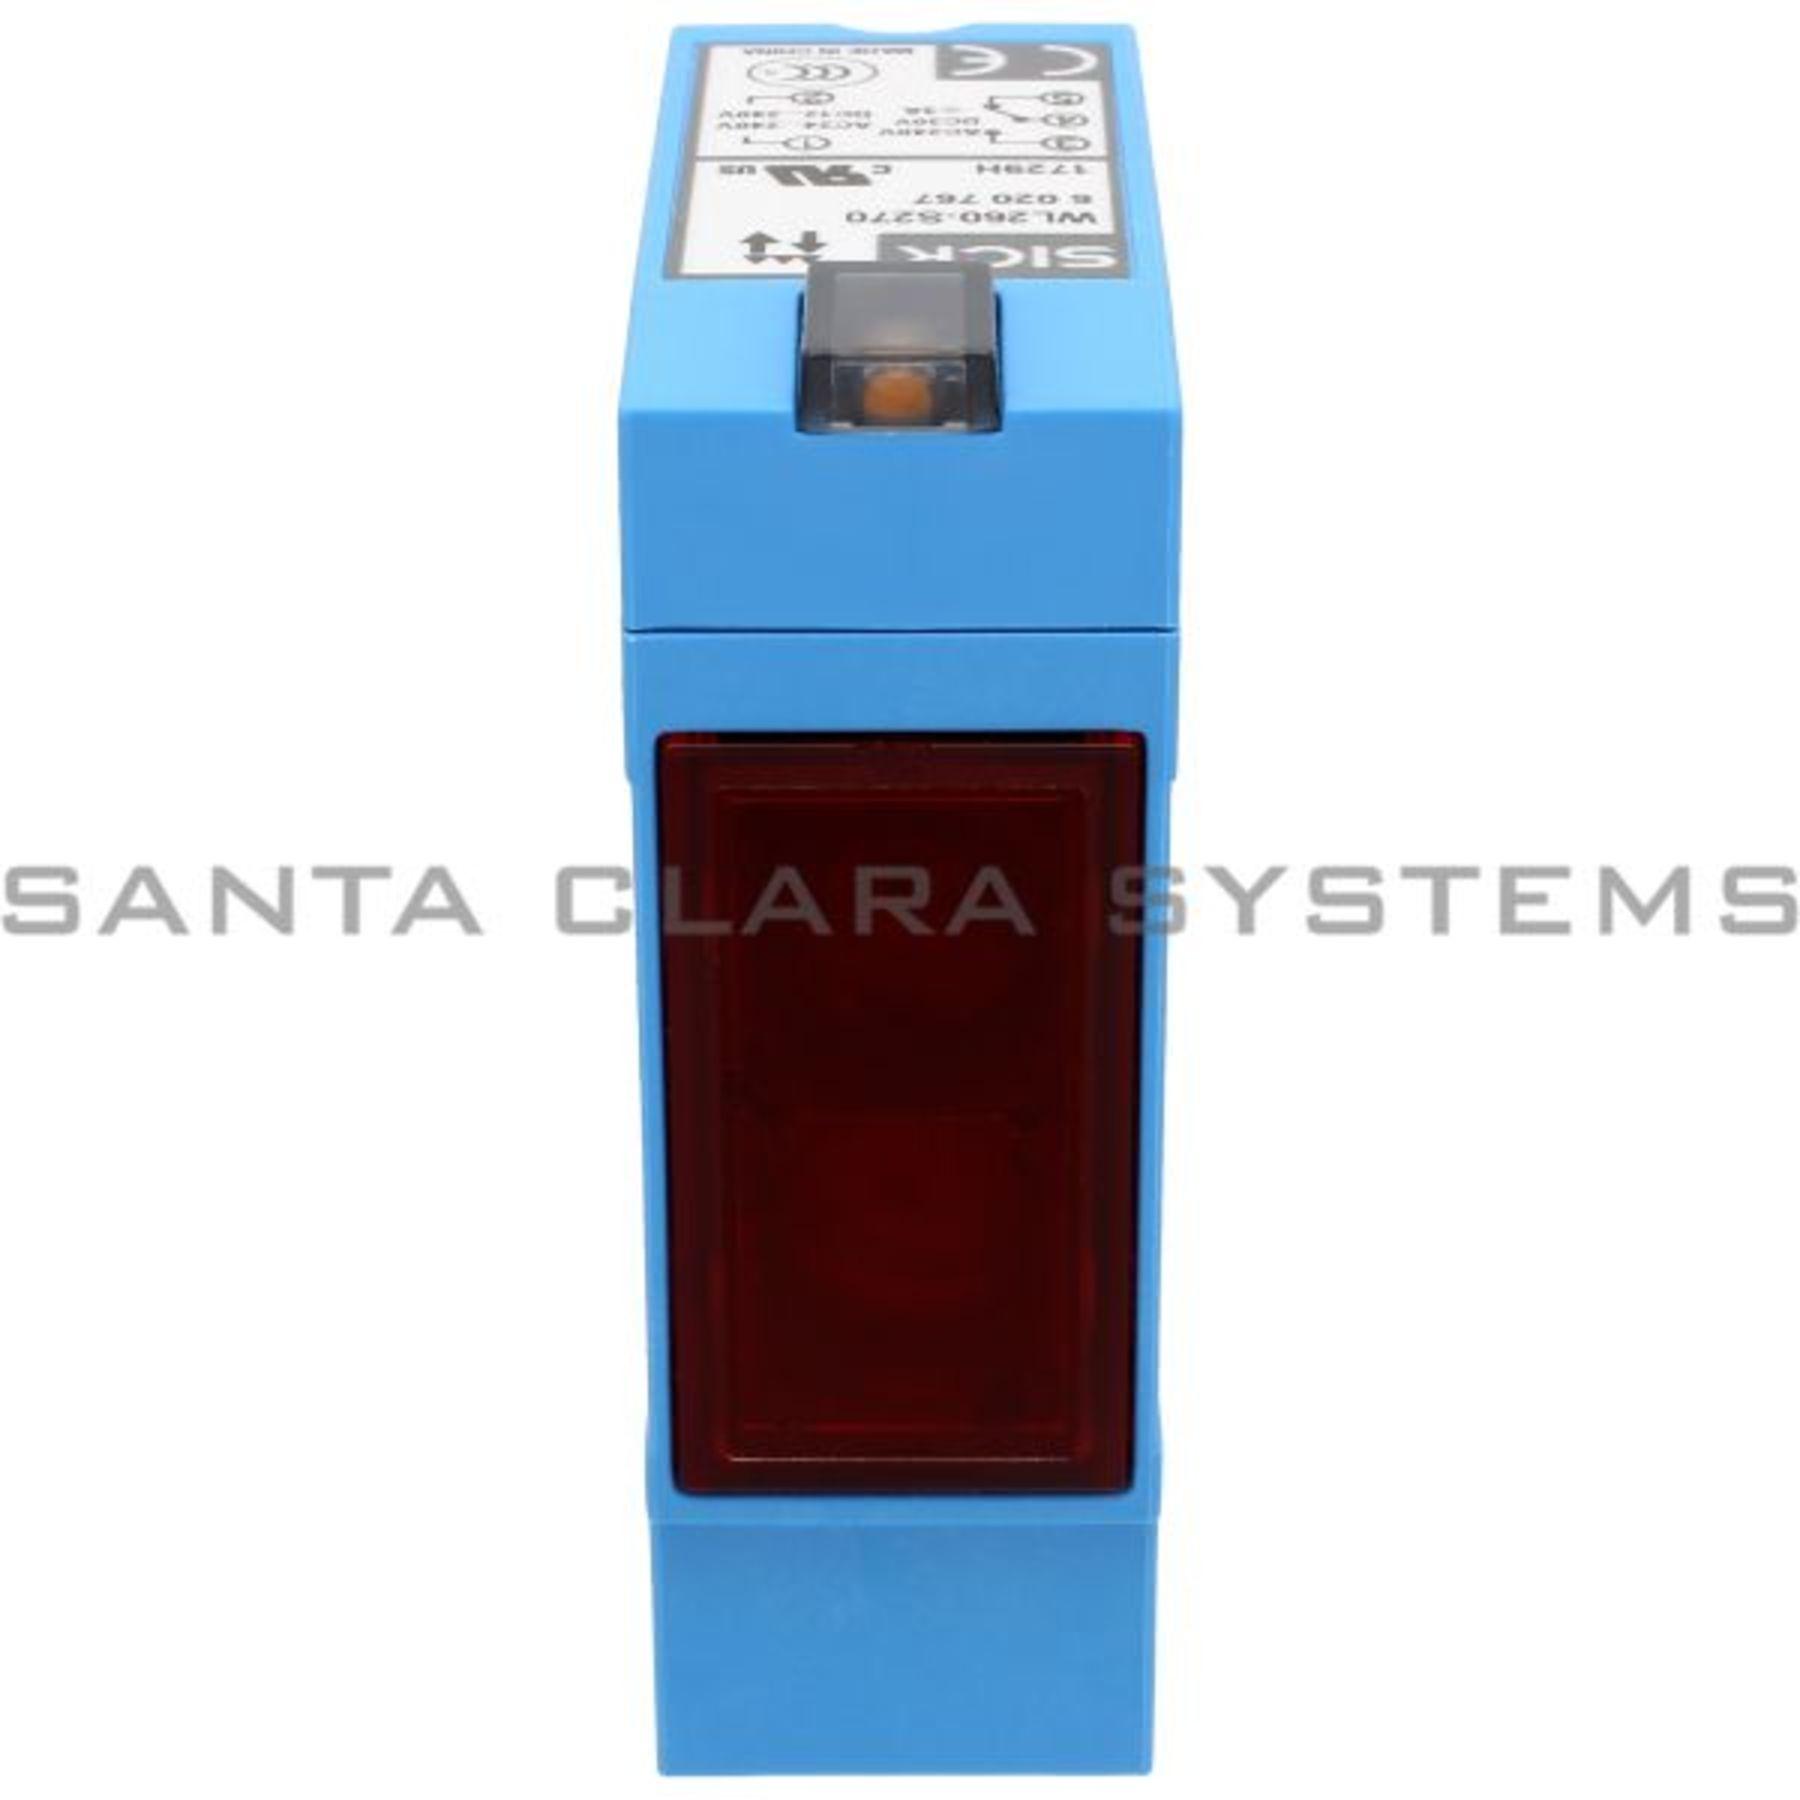 SICK WL260-S230 Reflective Photoelectric Sensor